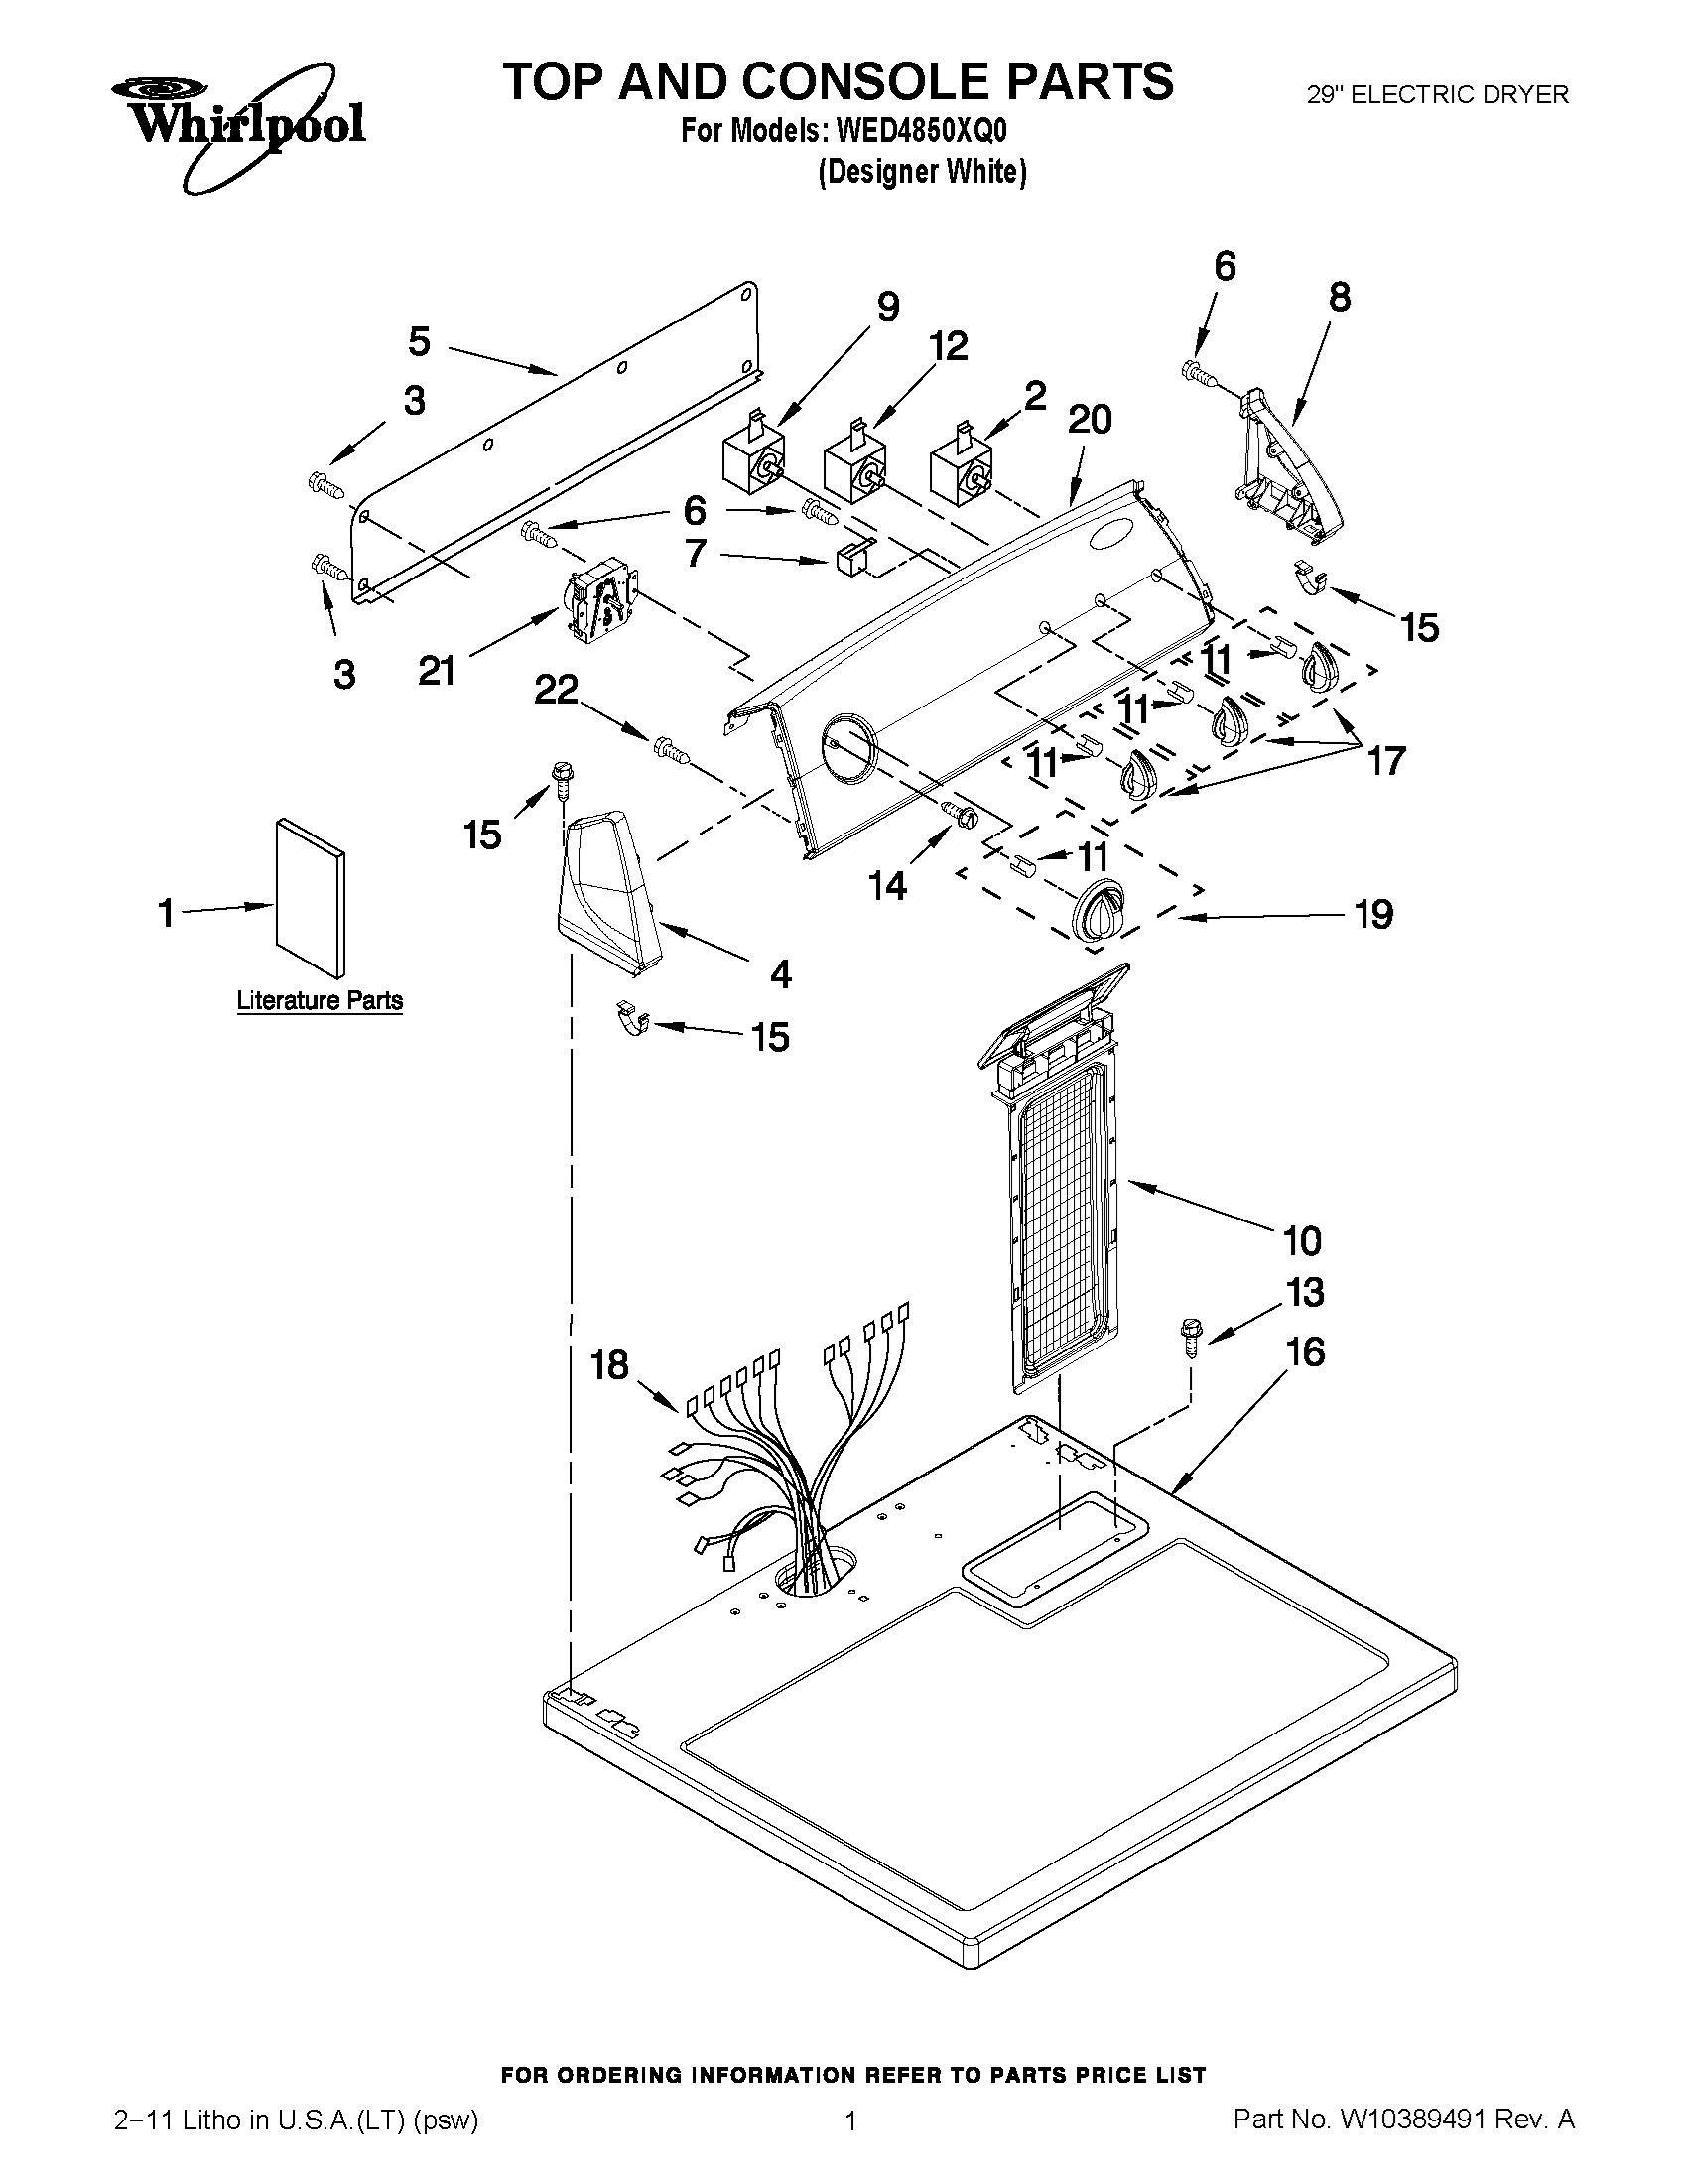 WhirlpoolImg_19000101 20150716_00201795?width\\d1000 whirlpool duet dryer wiring diagram efcaviation com boss bv9555 wiring diagram at bayanpartner.co